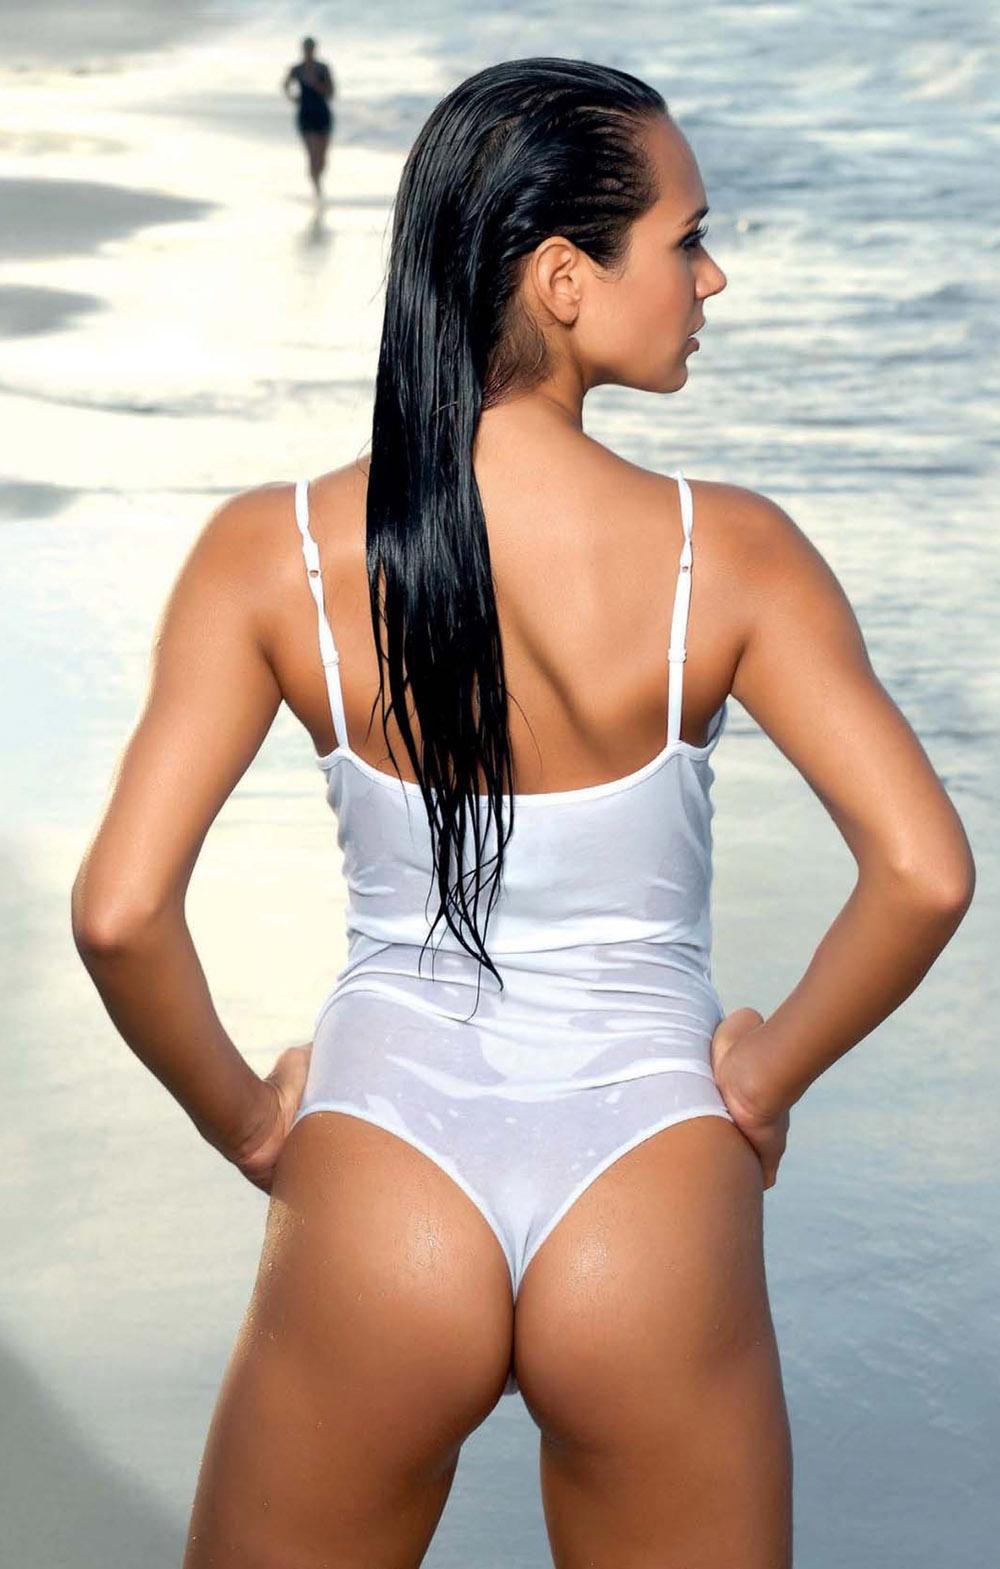 Габриэла Дворжакова голая. Фото - 29